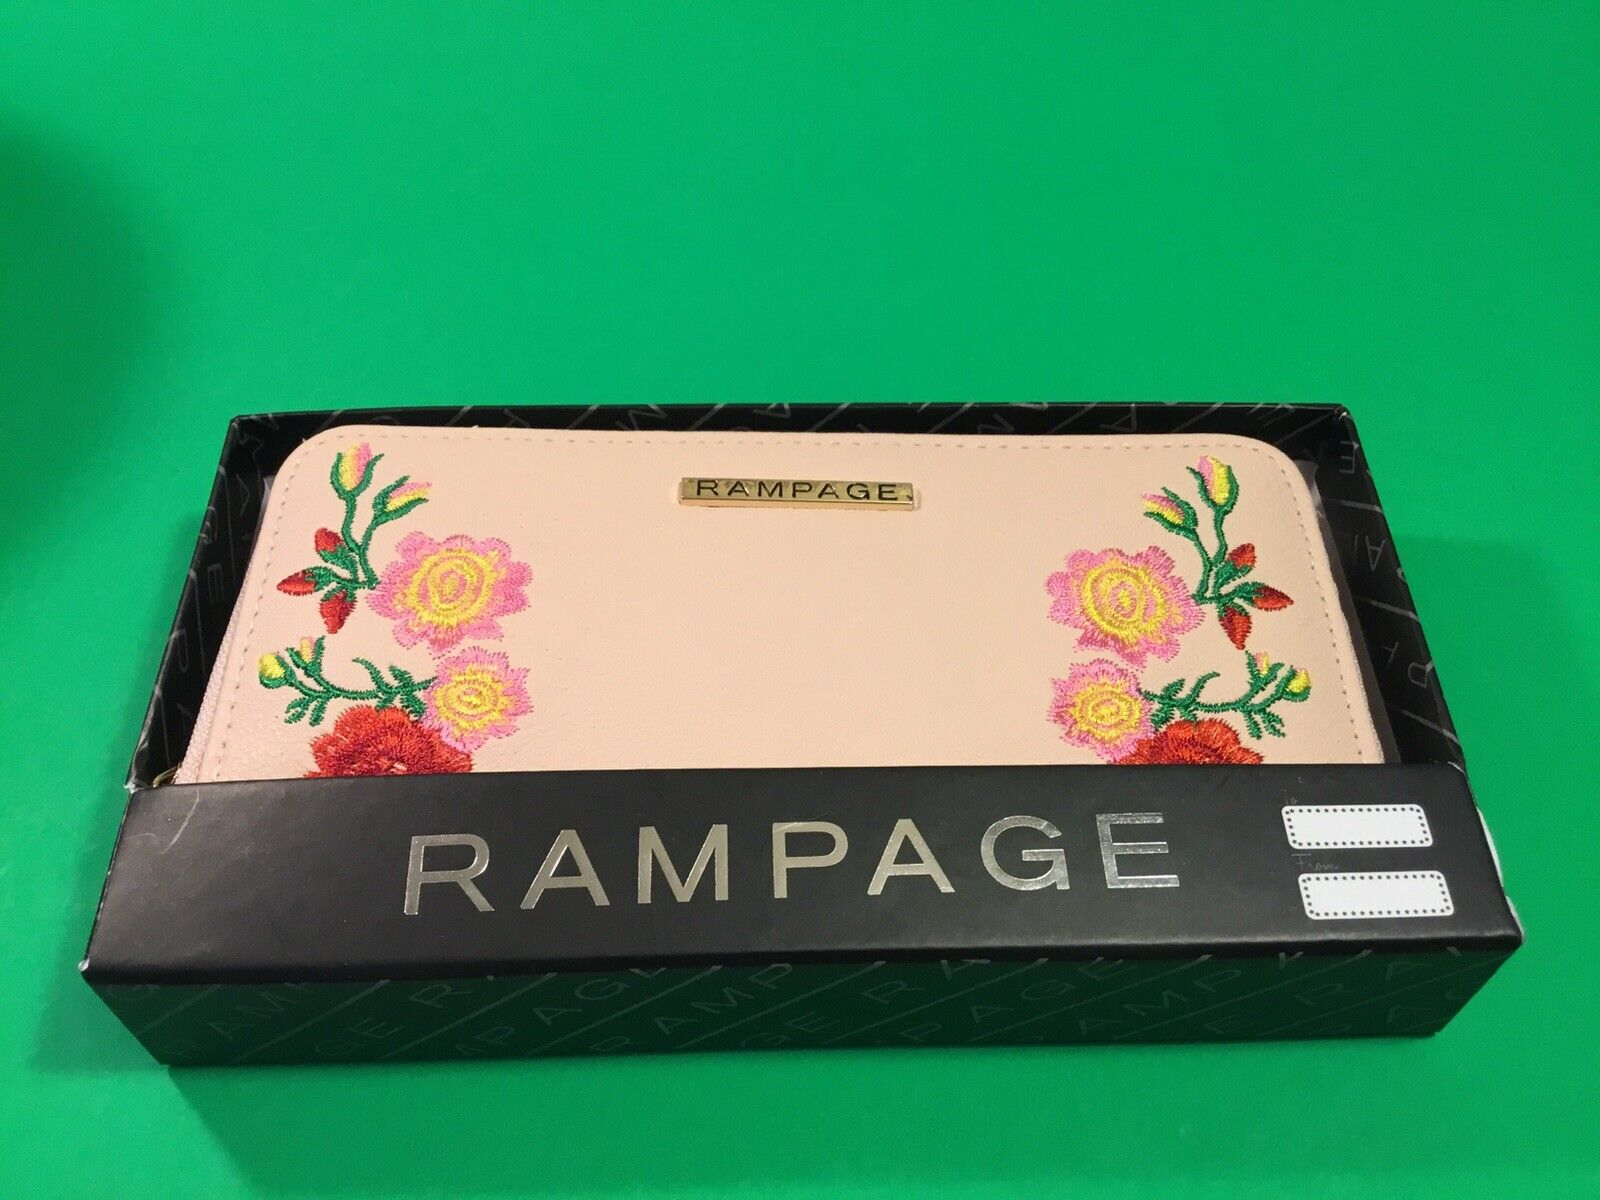 New ROMPAGE Woman's Wallet Pink w/Flowers